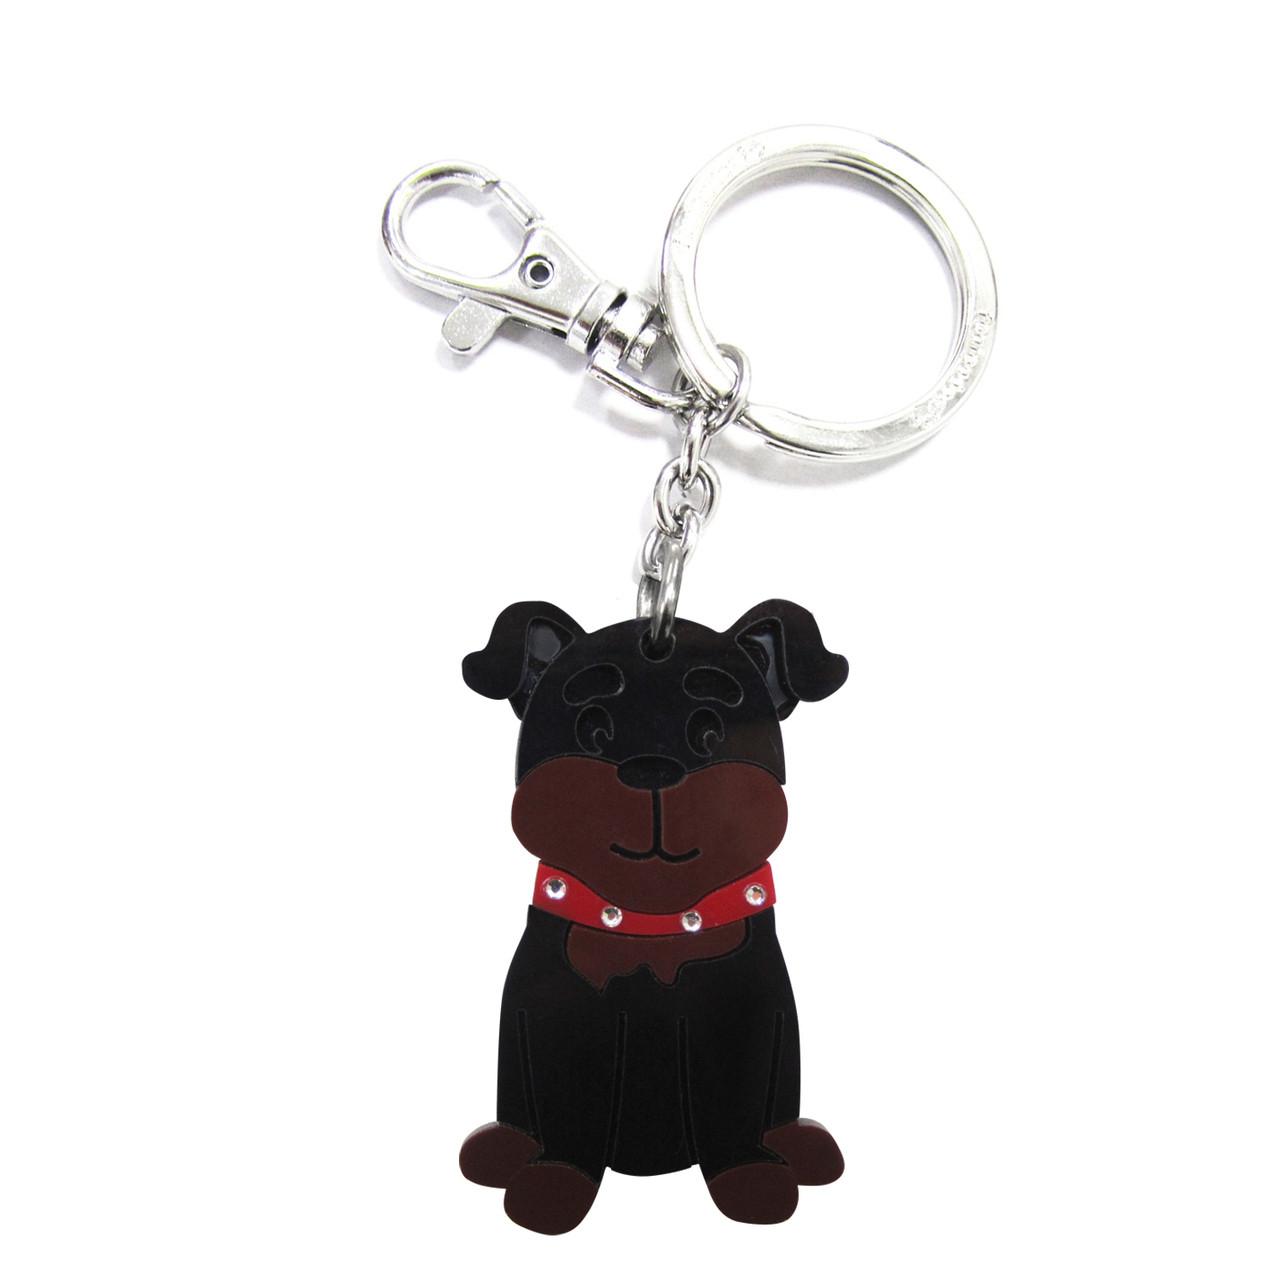 Rottweiler Key Chain 59cba942b